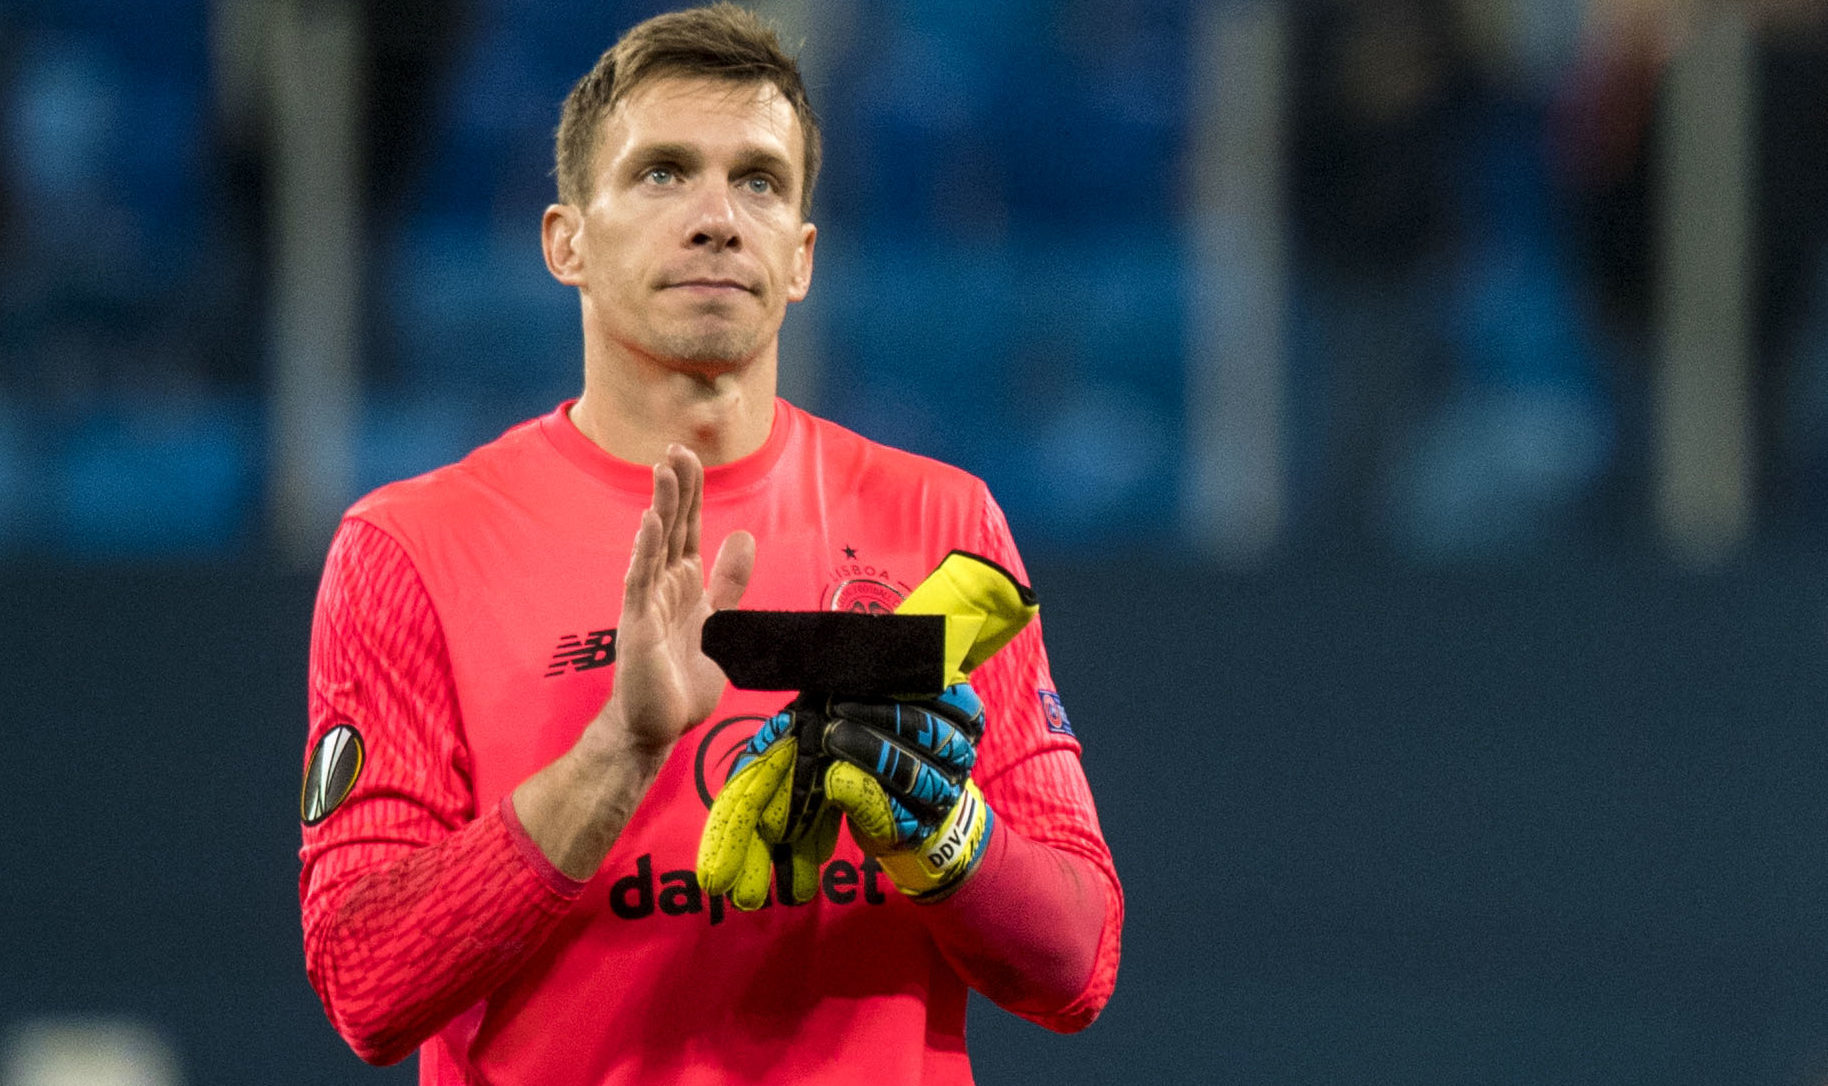 Celtic goalkeeper Dorus de Vries applauds the fans at full time (SNS Group / Craig Williamson)